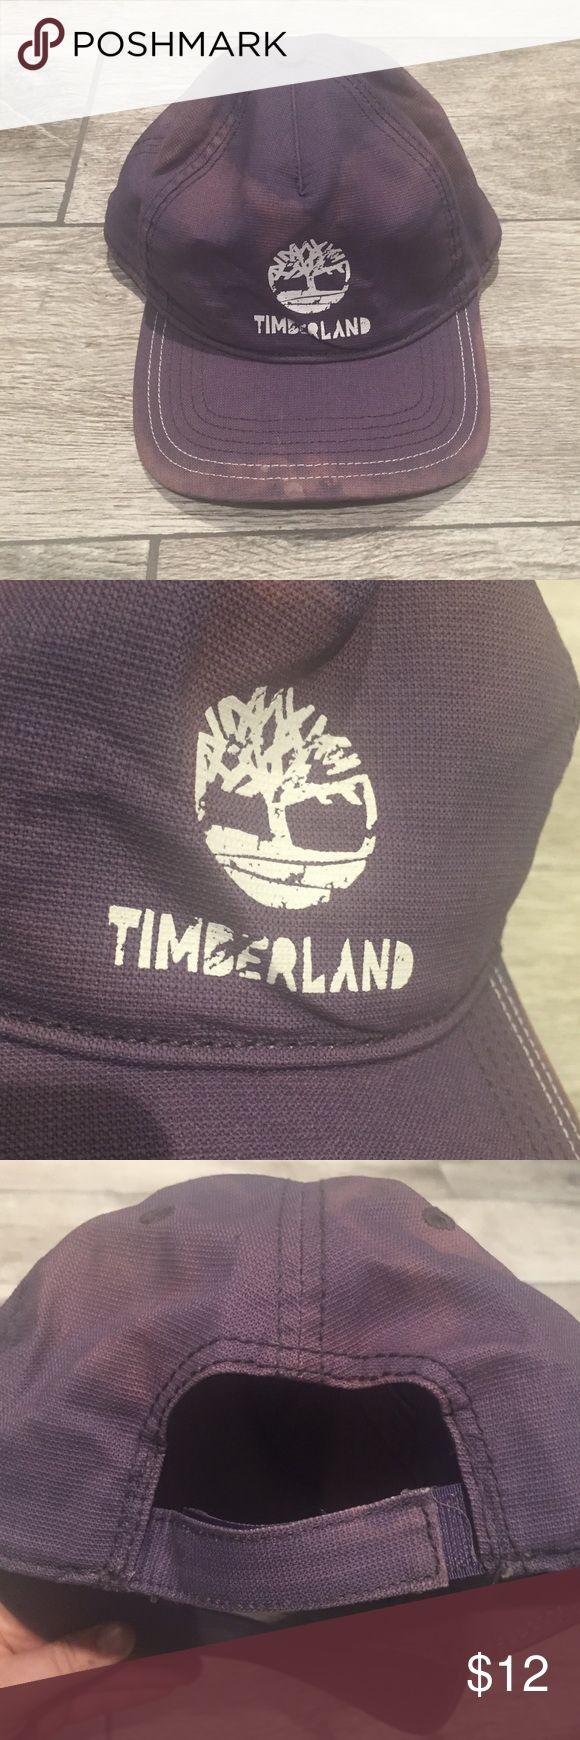 Timberland hat Velcro, tie dye, baseball style hat Timberland Accessories Hats